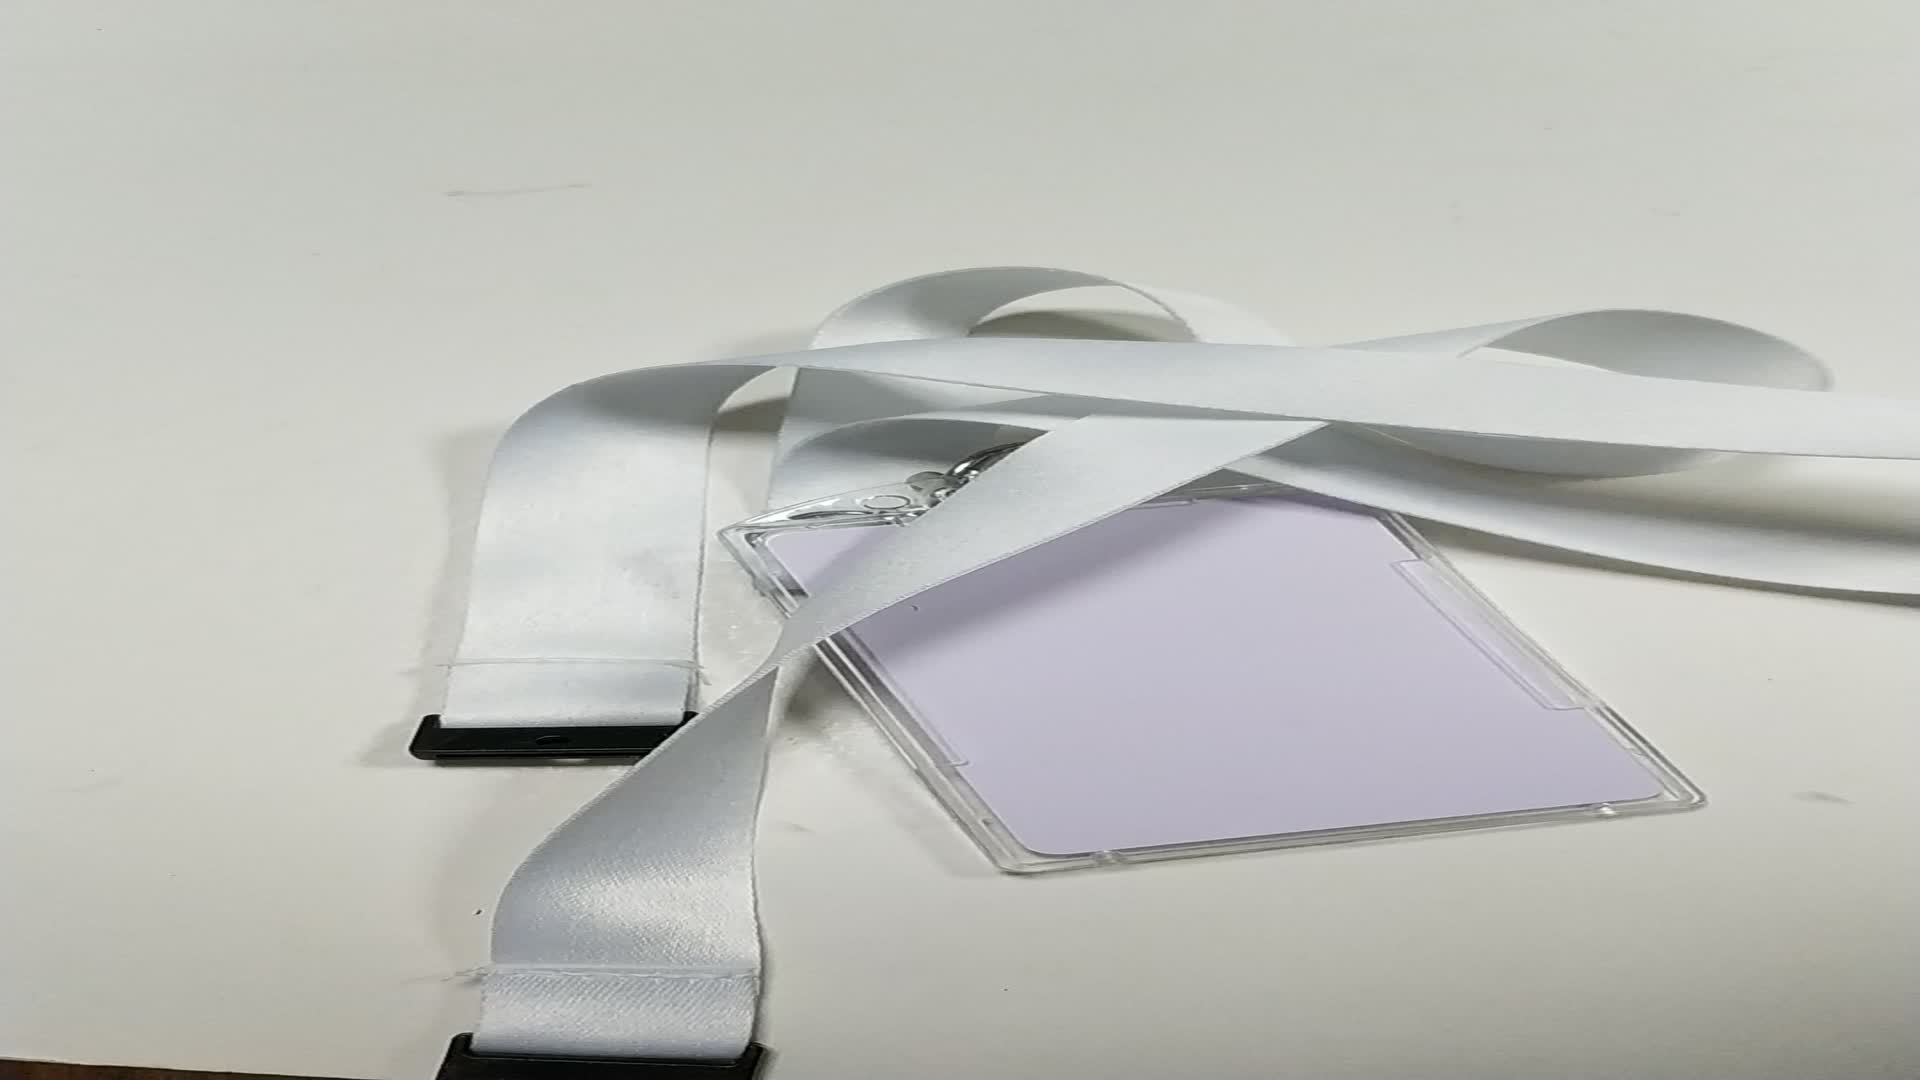 Custom Brand Name Lanyard Maker, Safety Clip Blank Sublimation Lanyard Design For Keys